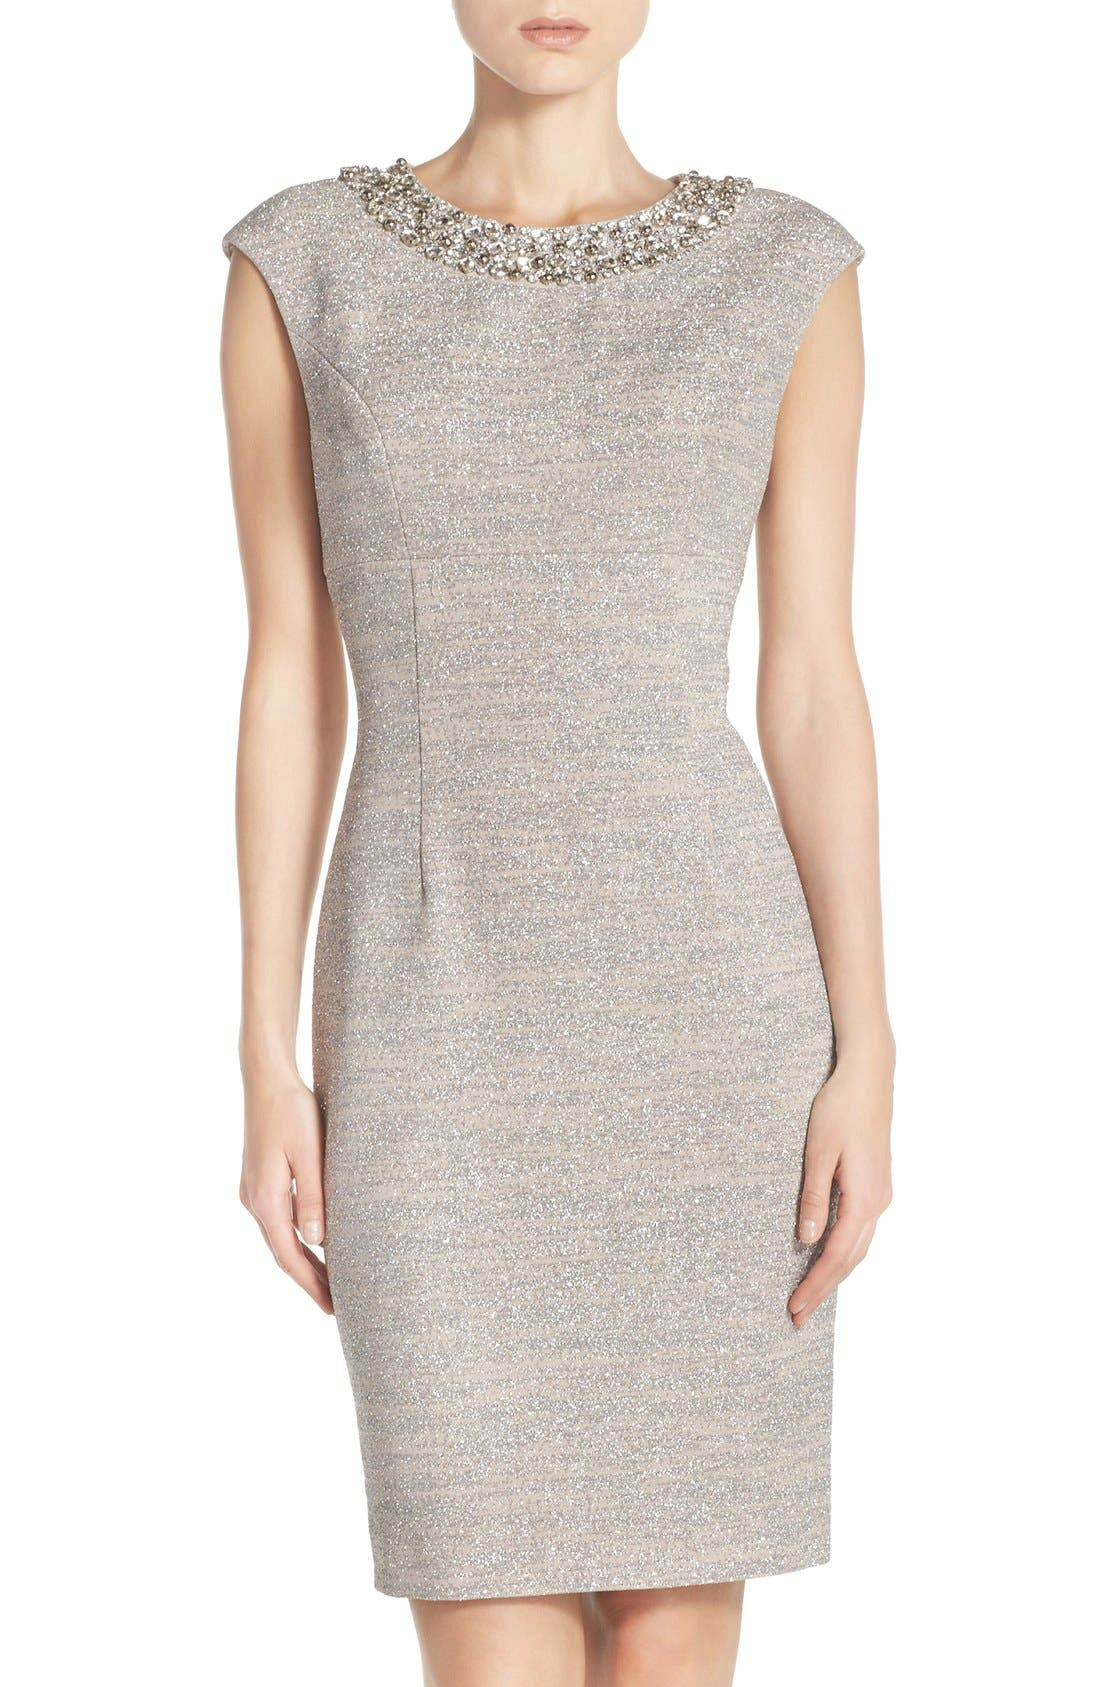 Alternate Image 1 Selected - Eliza J Embellished Sparkle Knit Sheath Dress (Regular & Petite)